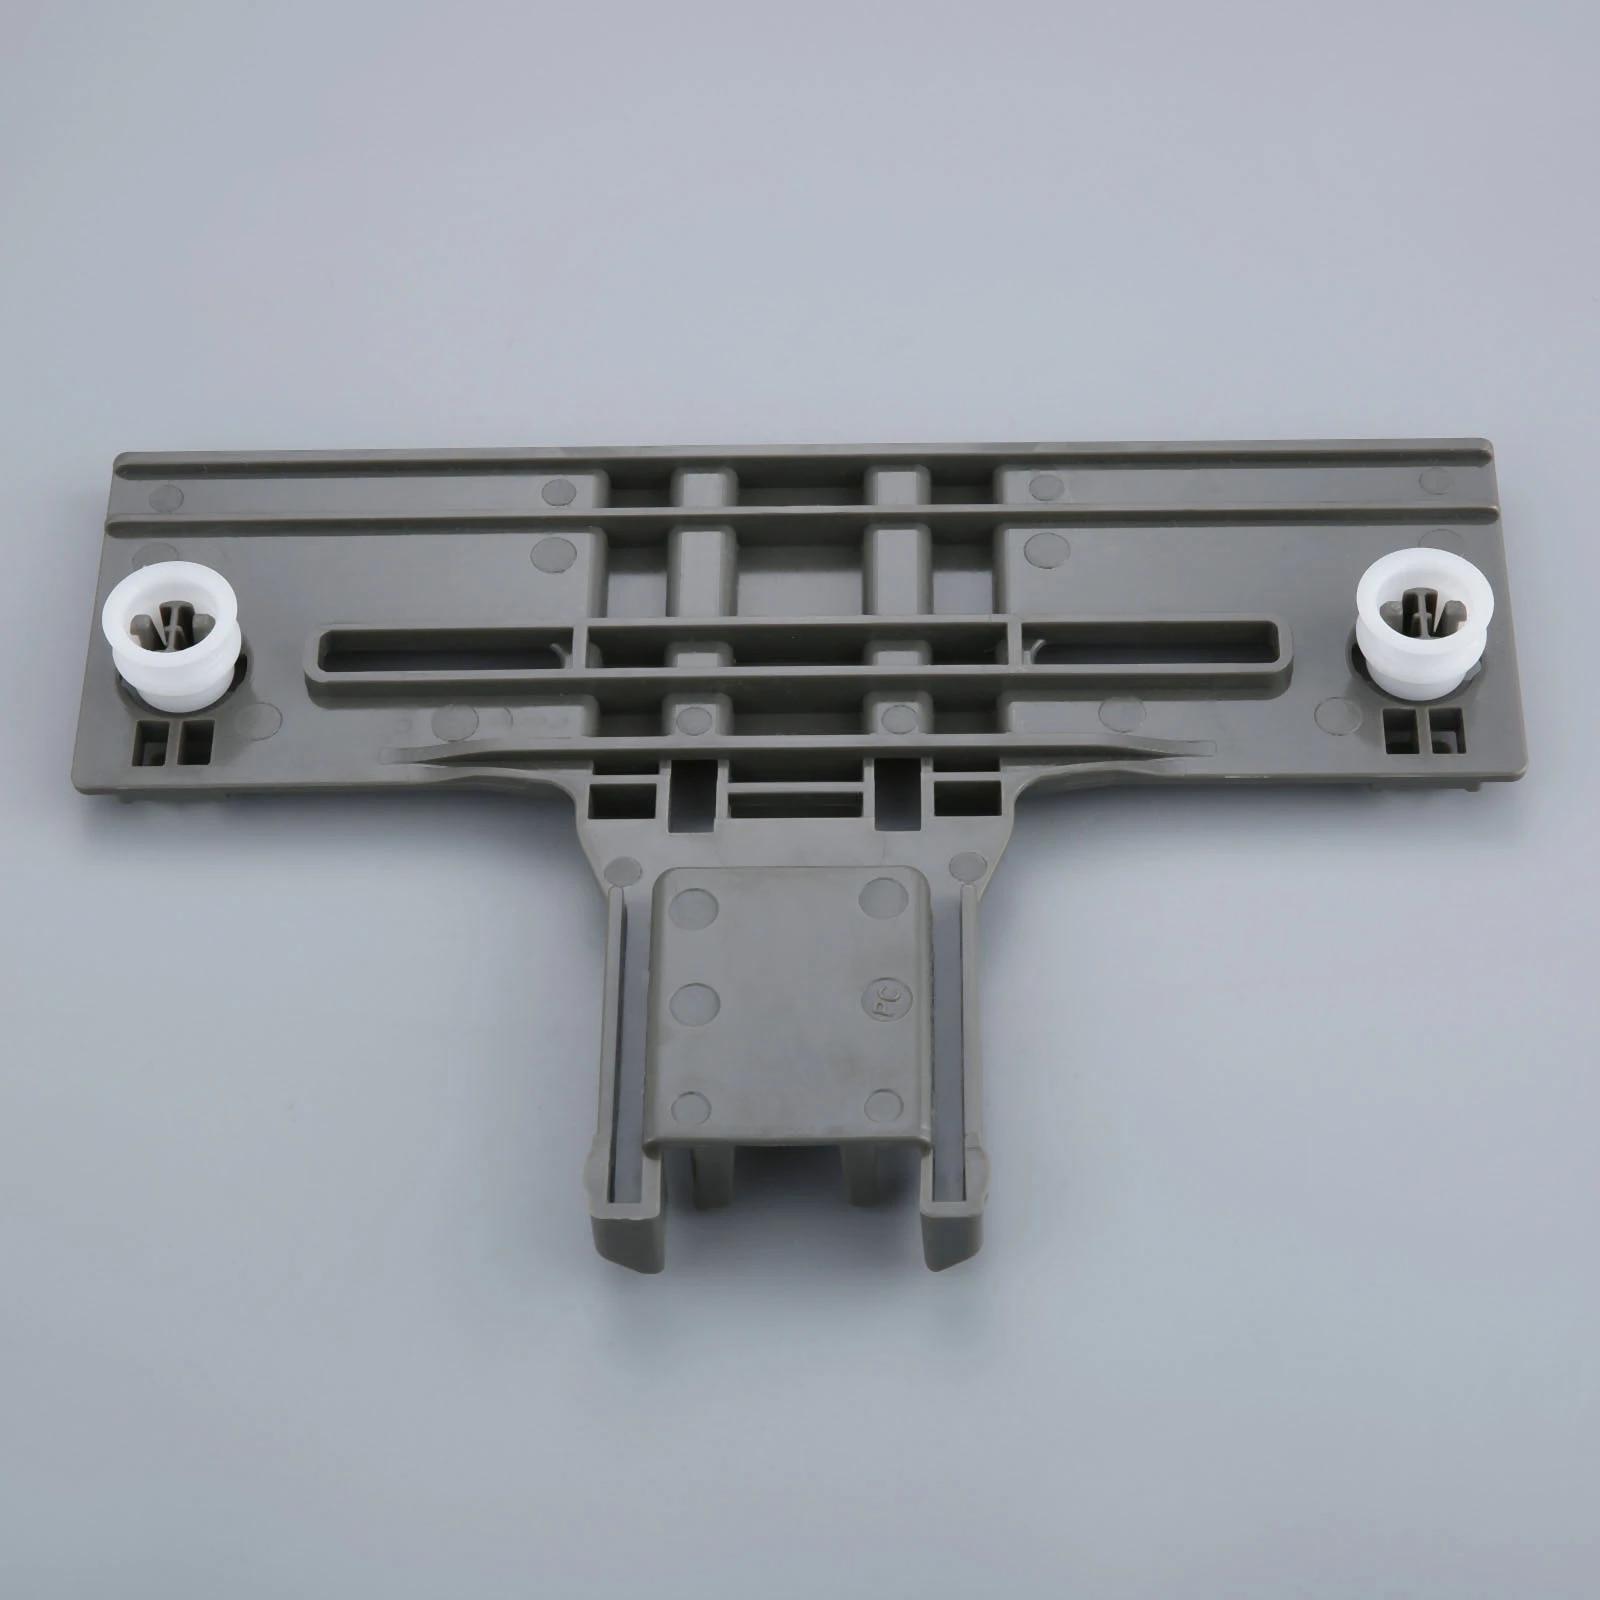 dishwasher upper rack adjuster fits for whirlpool kitchenaid kenmore jenn air w10350376 ap5272176